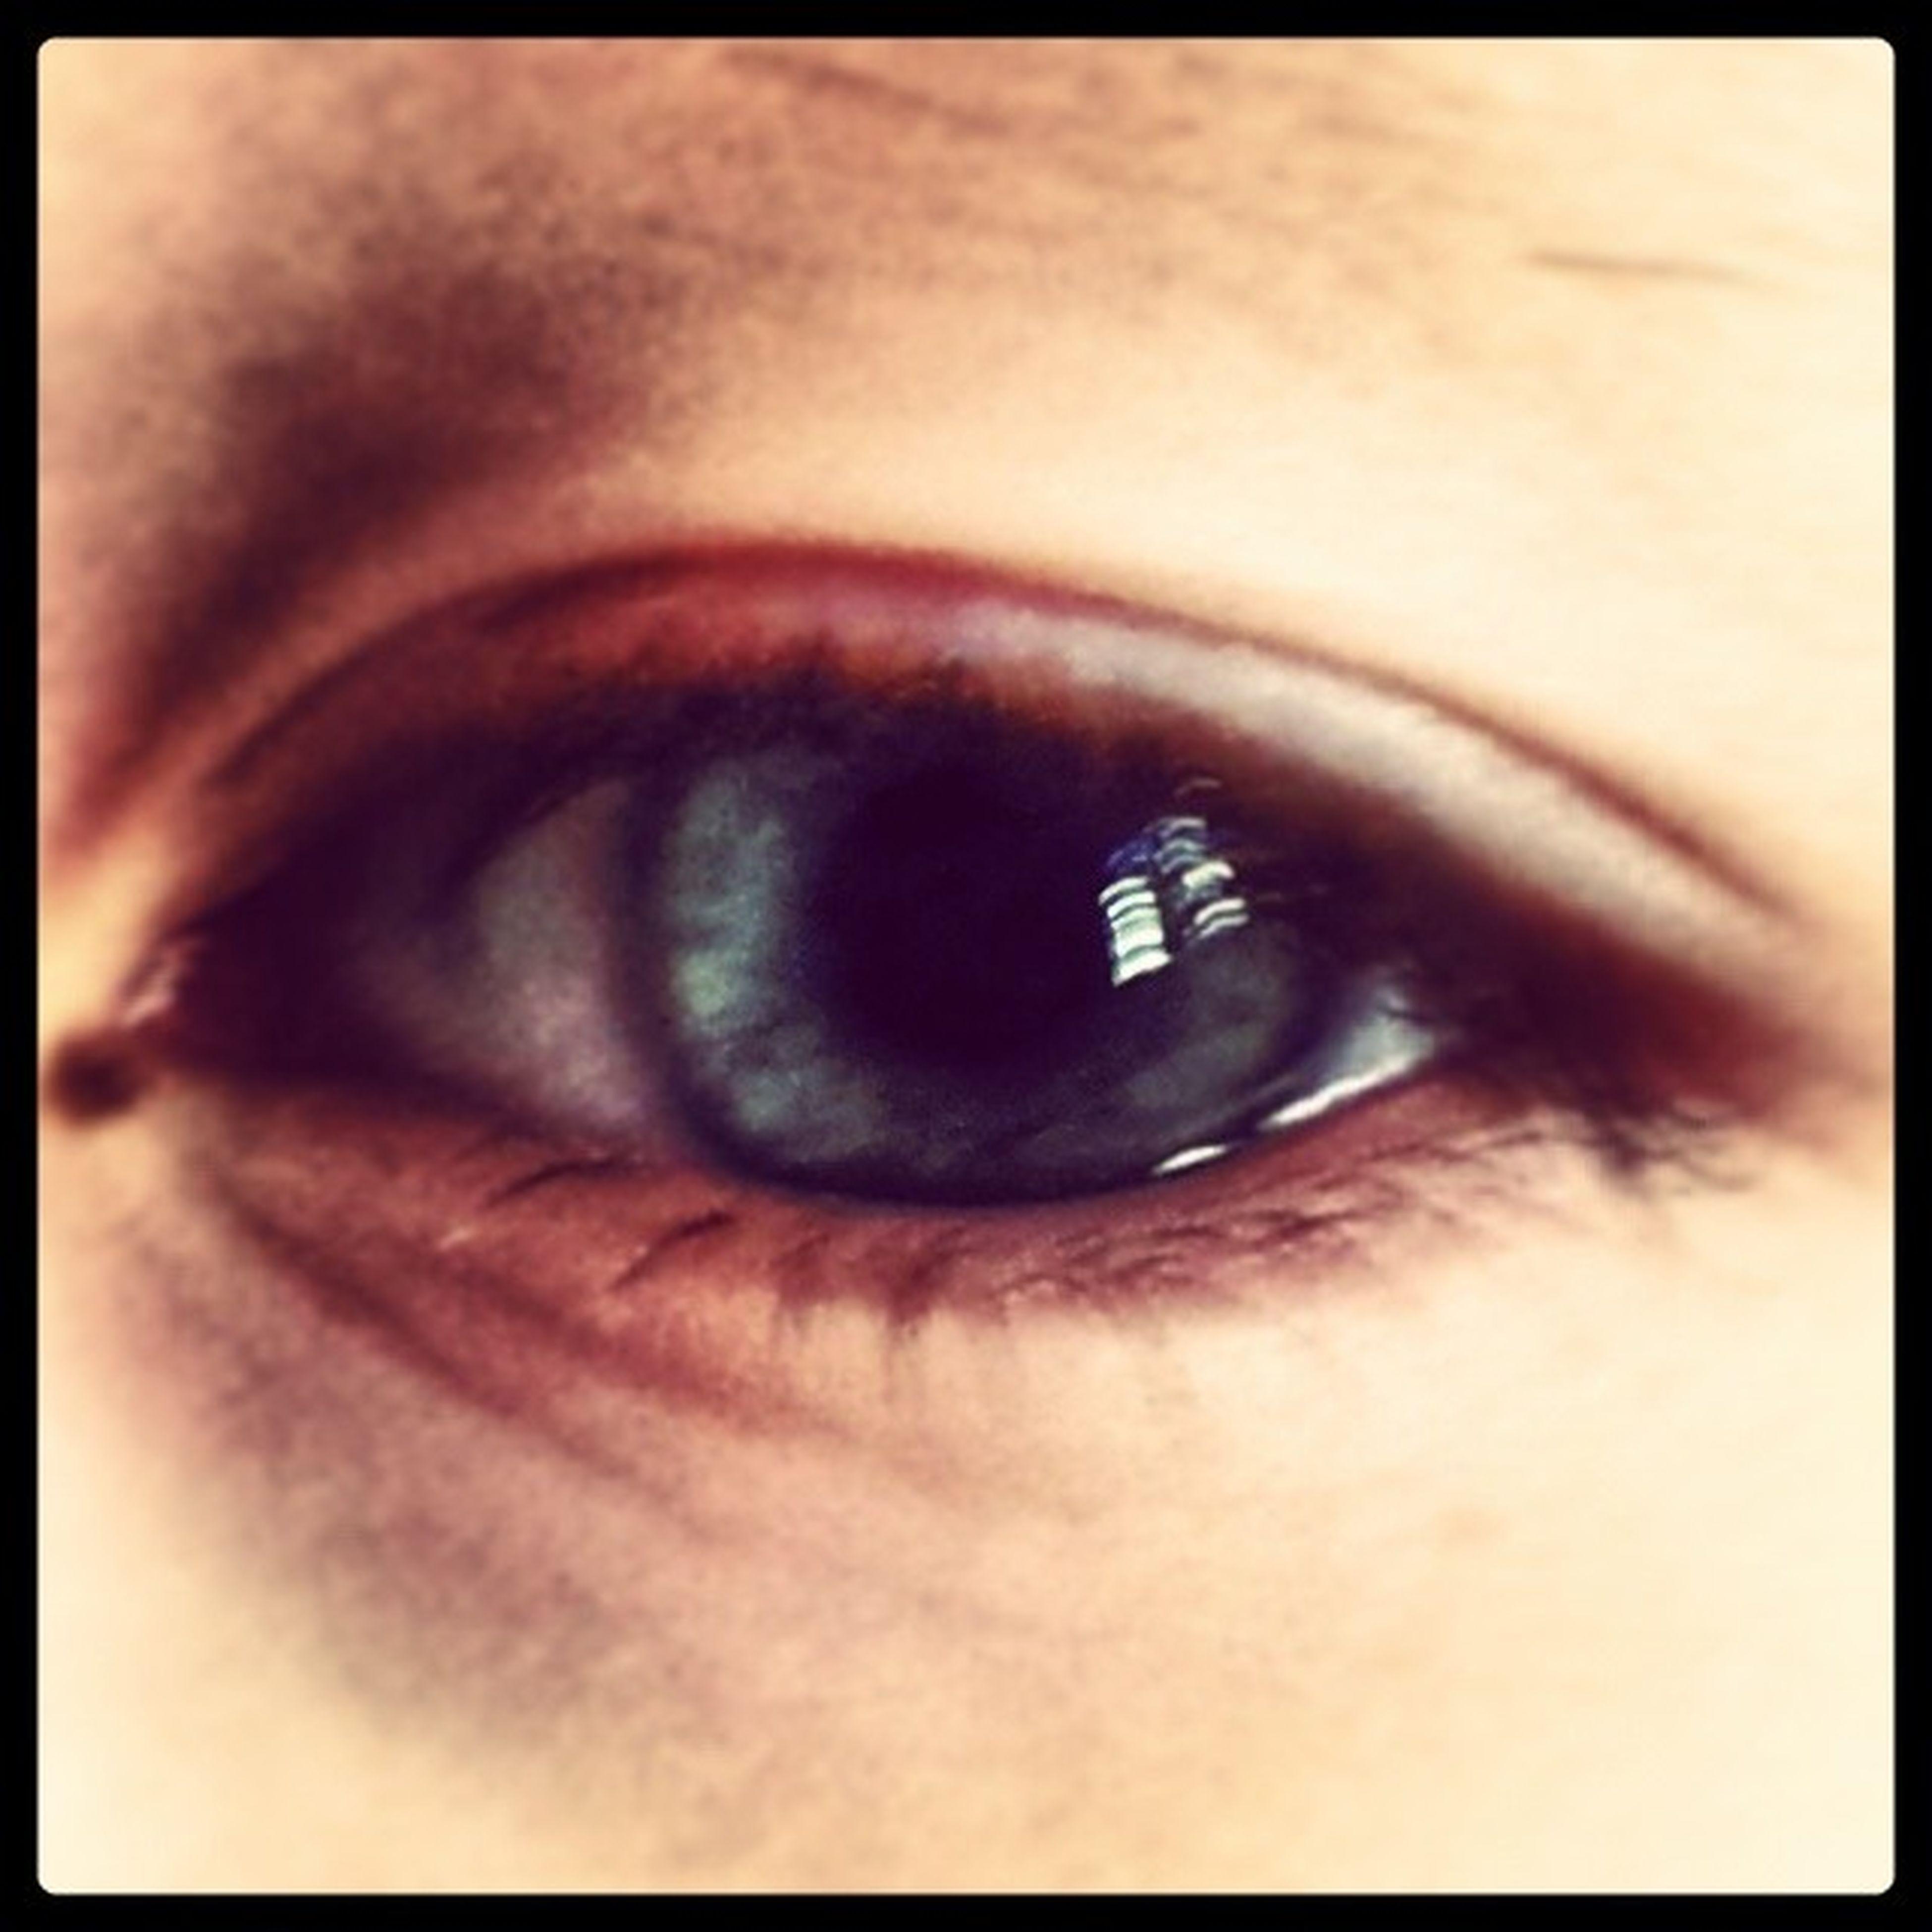 human eye, close-up, transfer print, auto post production filter, eyelash, eyesight, portrait, looking at camera, sensory perception, part of, human face, iris - eye, lifestyles, human skin, headshot, extreme close-up, unrecognizable person